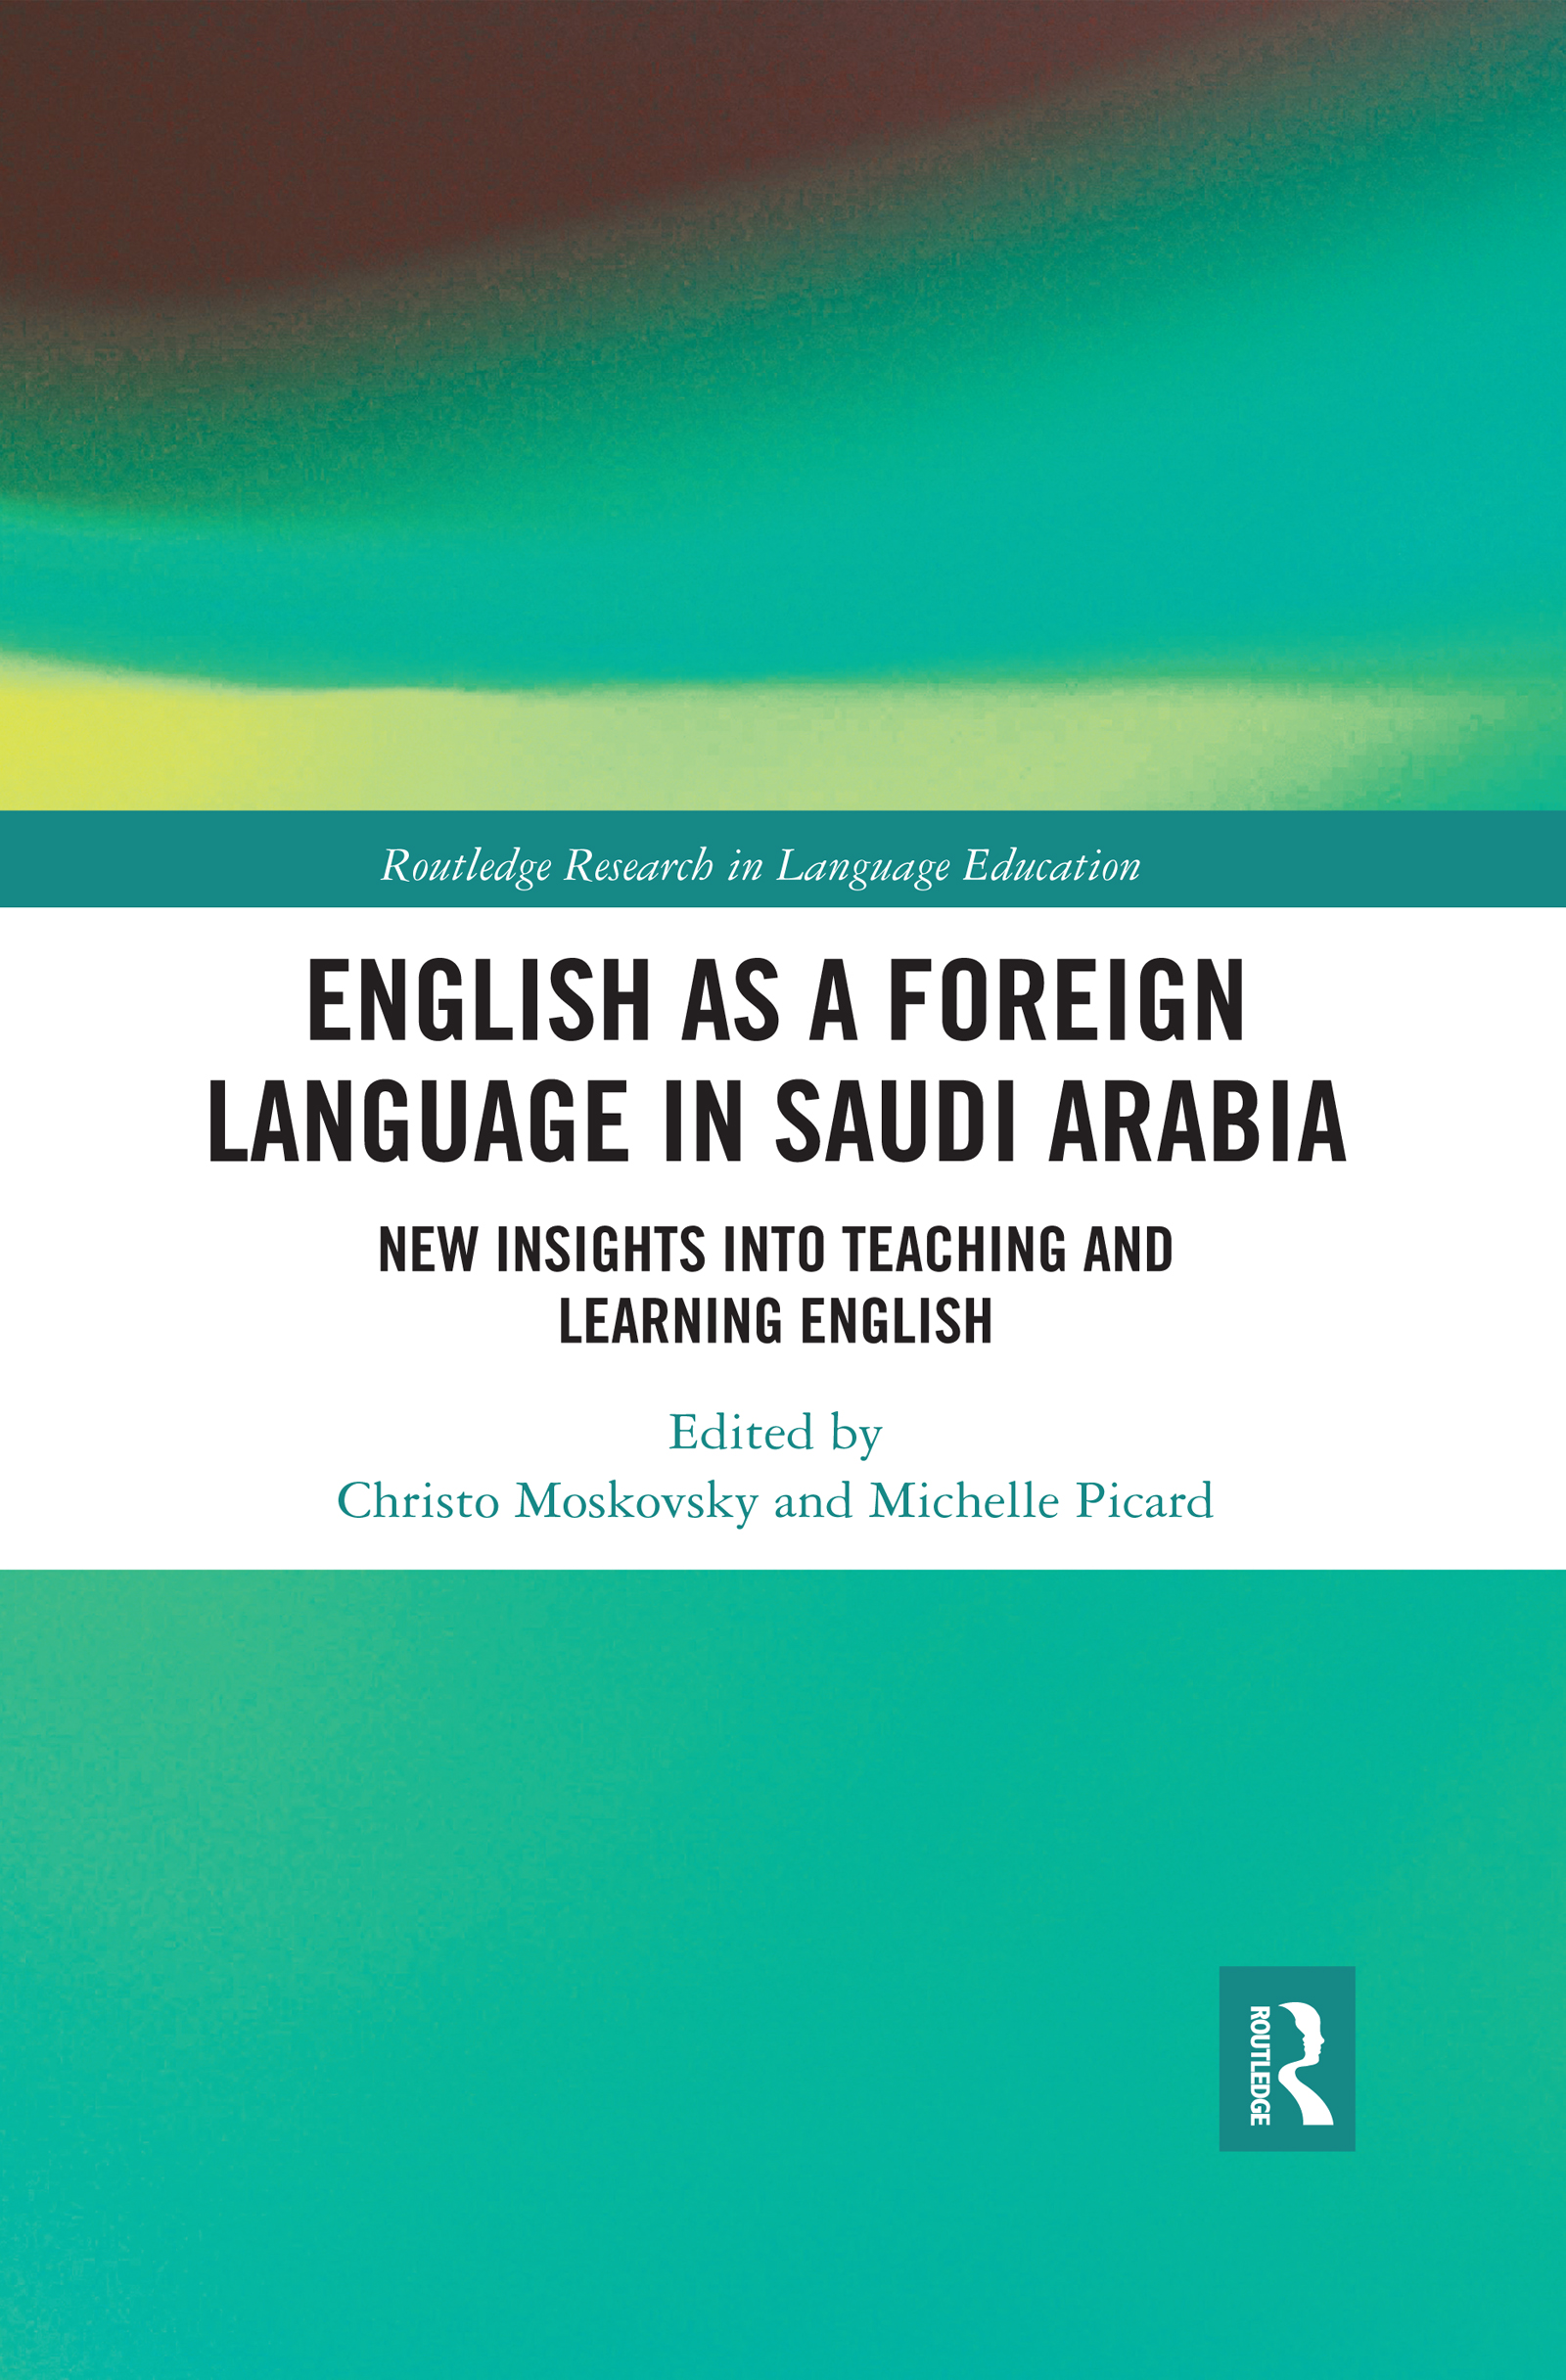 English as a Foreign Language in Saudi Arabia